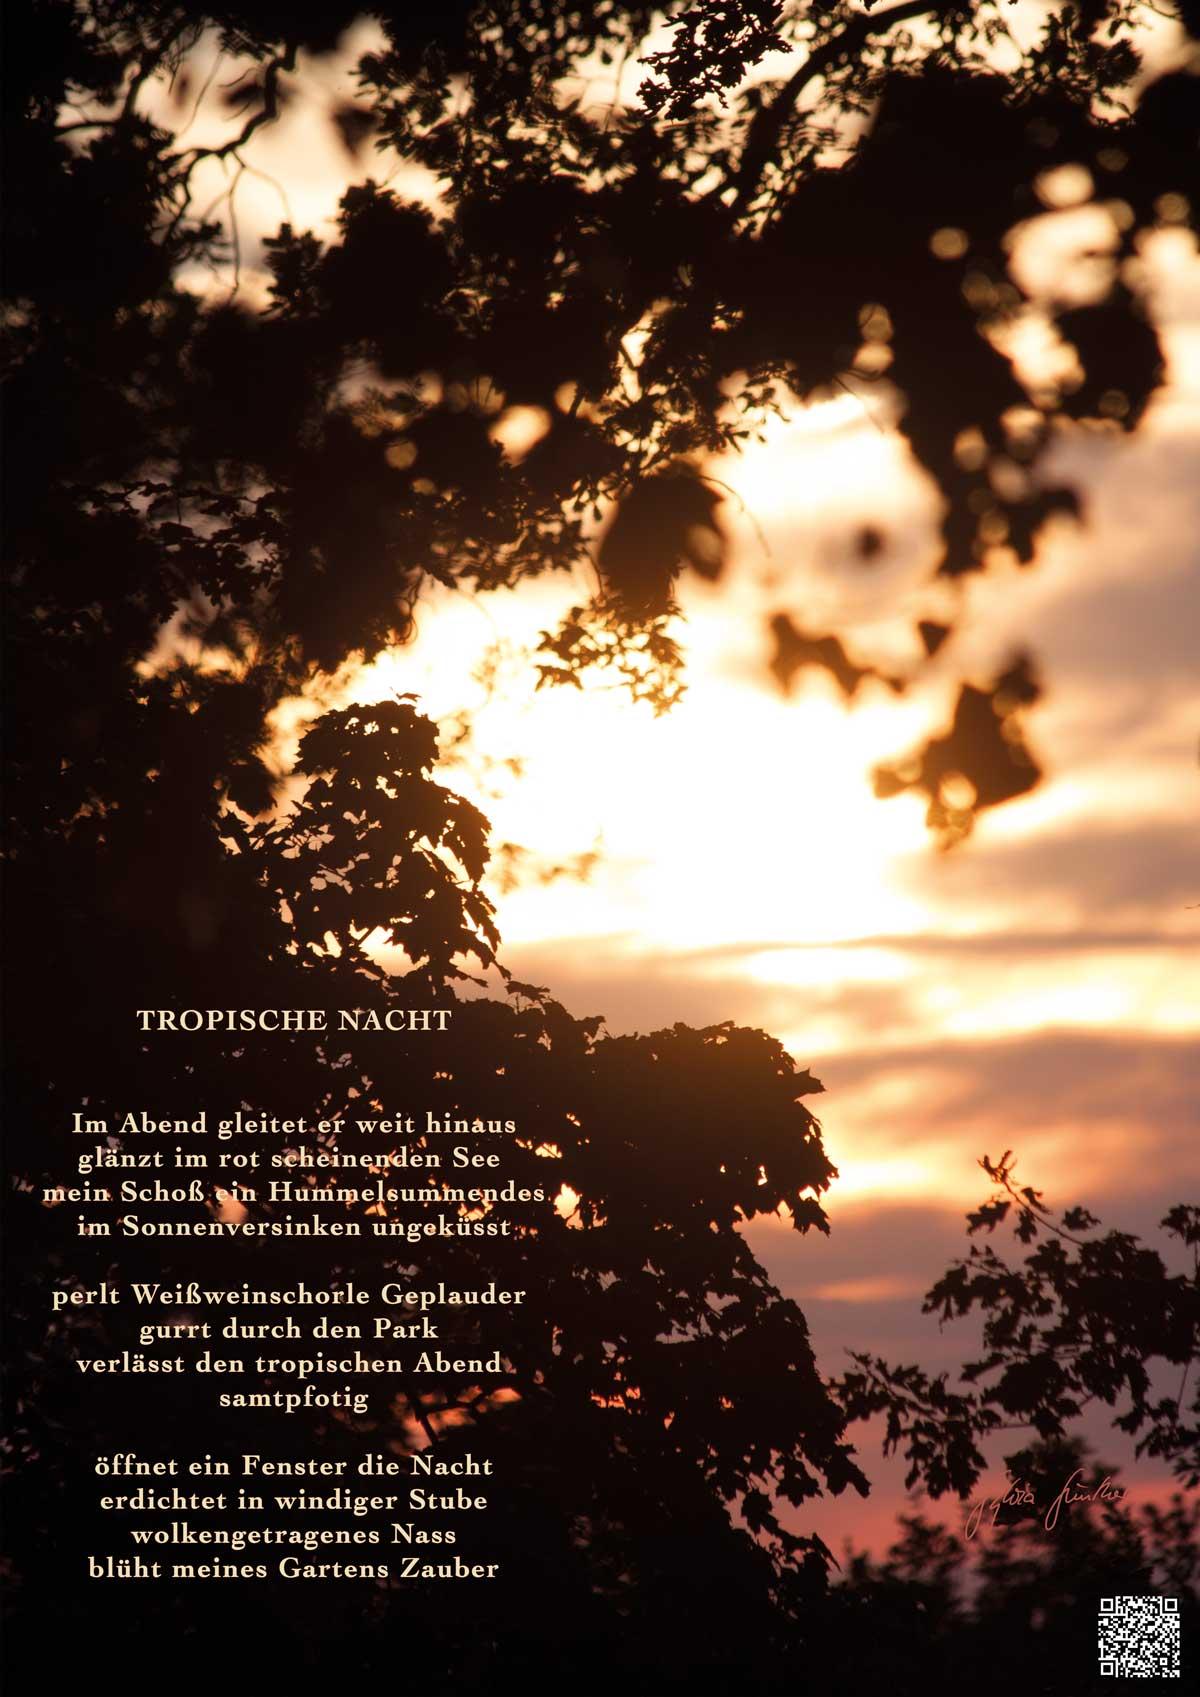 Soundpics: 78 Tropische Nacht